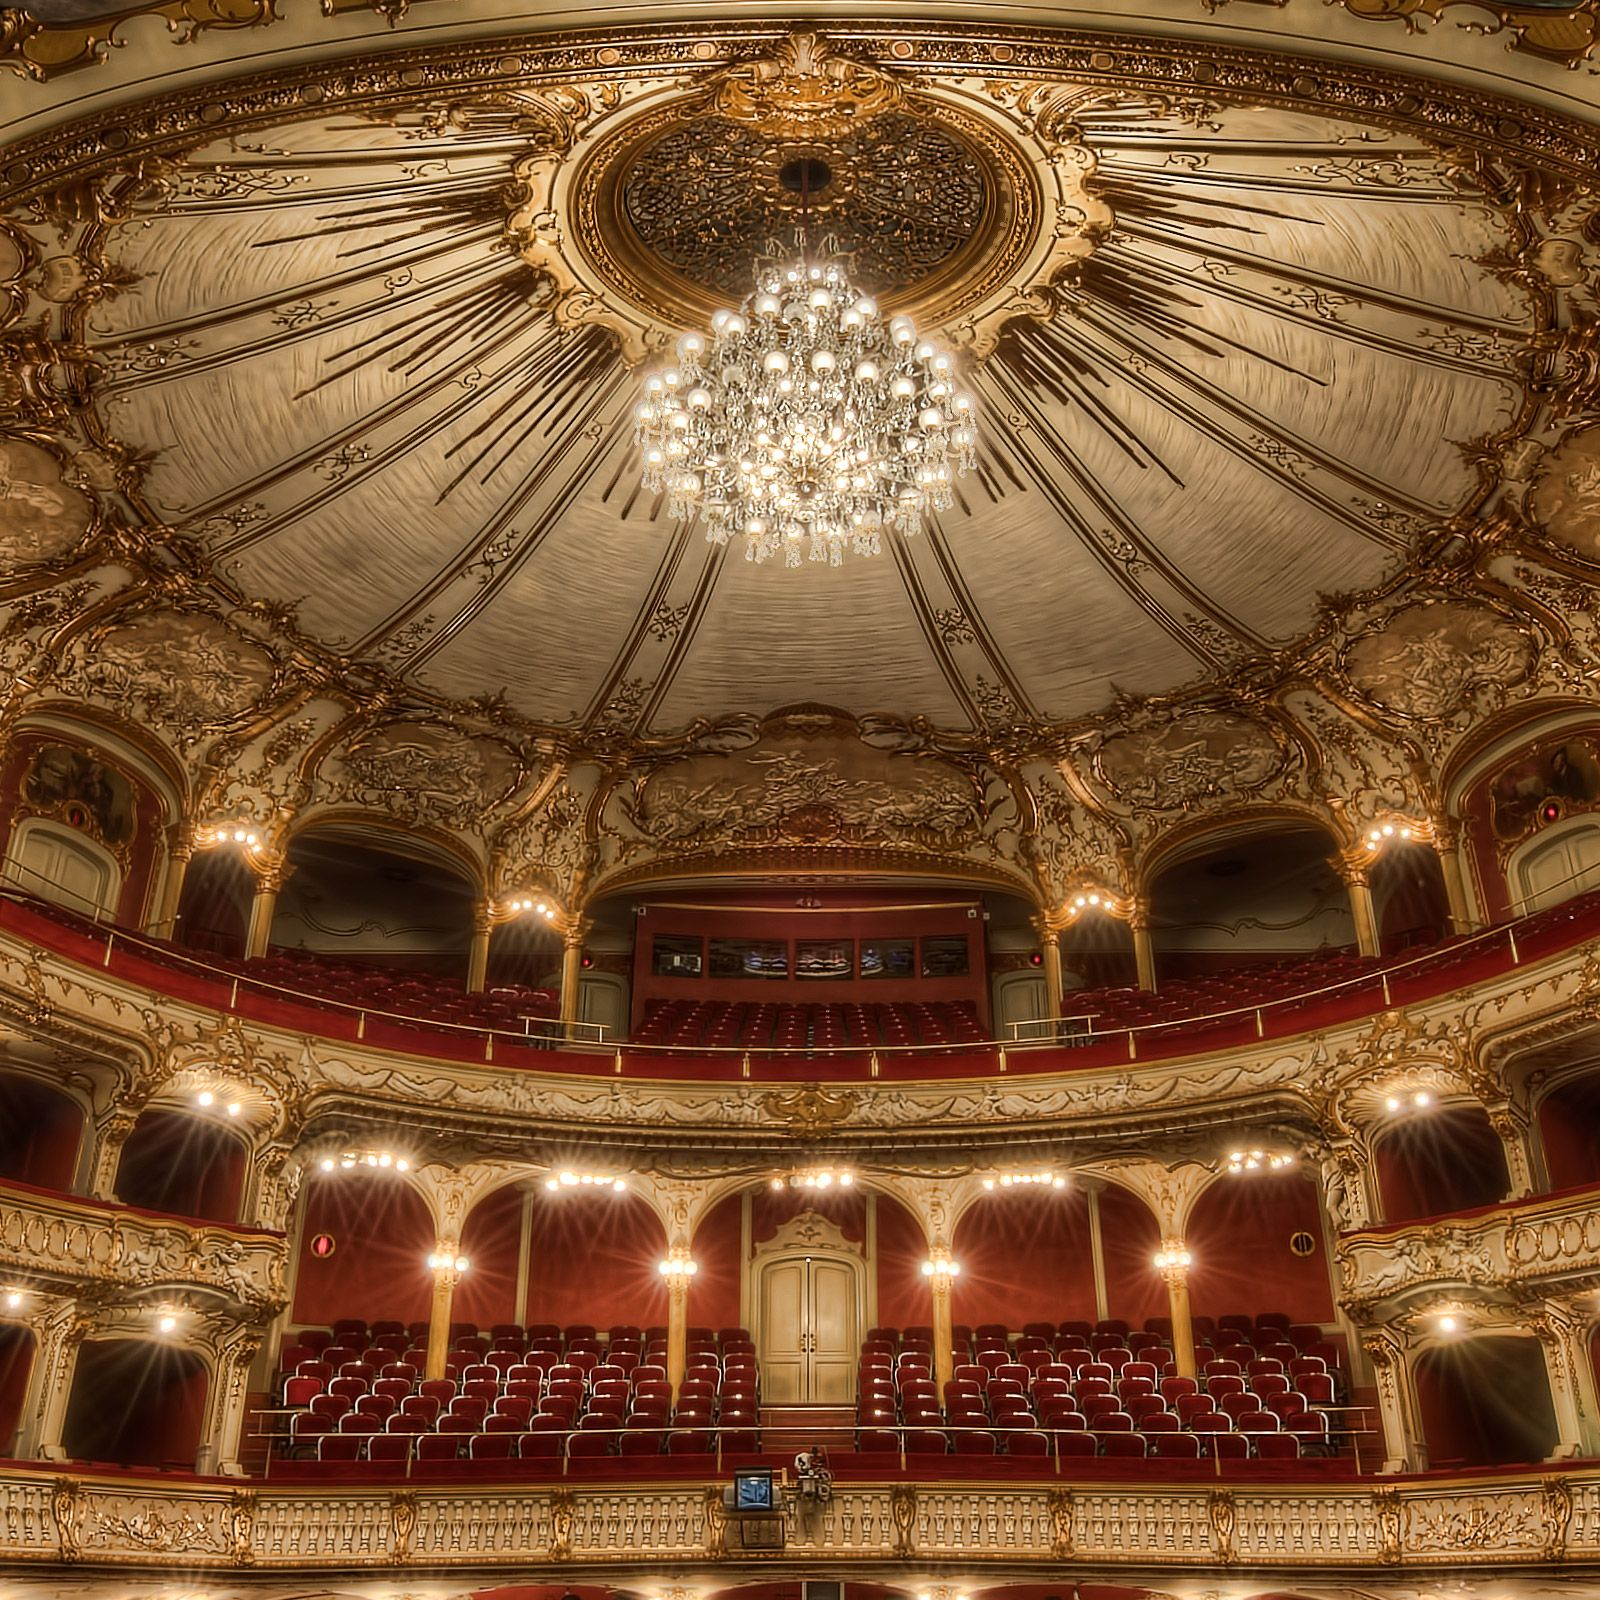 Fotos Bei Space Hall: Opernhaus Graz / Opera House Graz